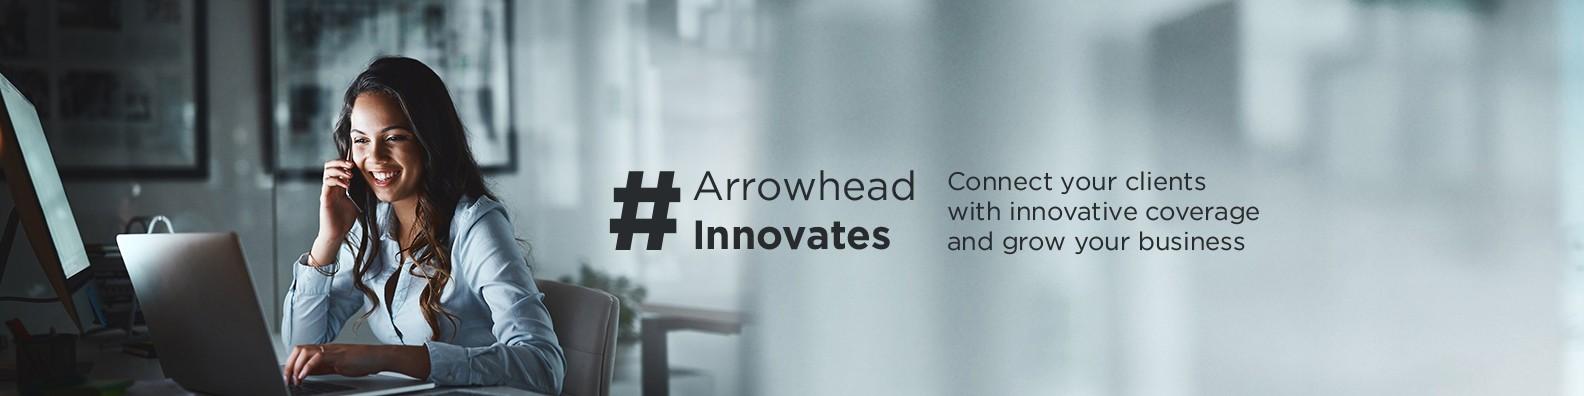 Arrowhead General Insurance Agency Inc Linkedin